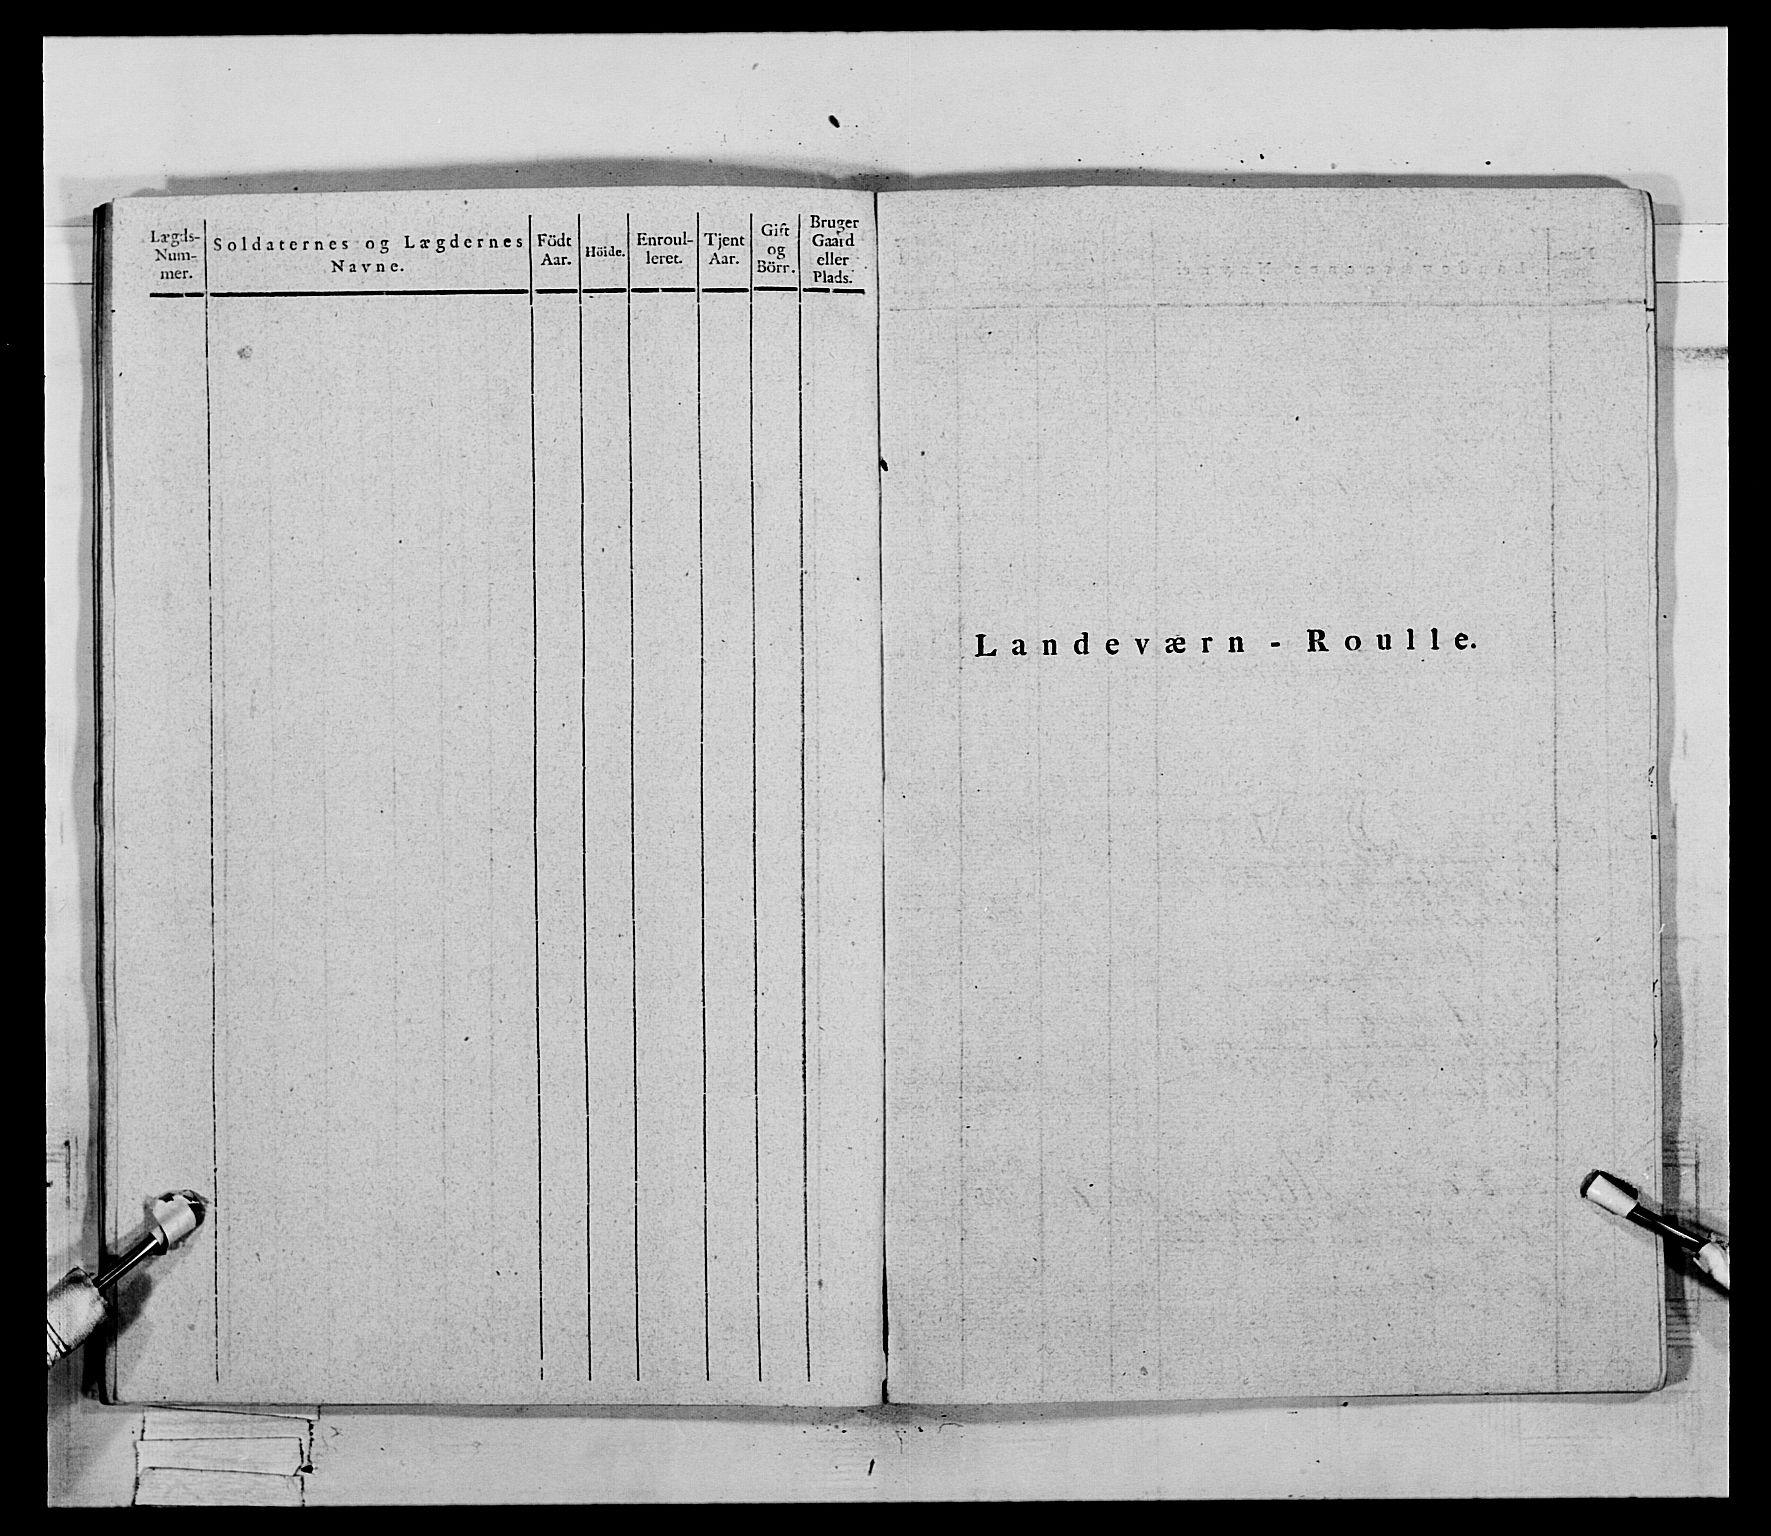 RA, Generalitets- og kommissariatskollegiet, Det kongelige norske kommissariatskollegium, E/Eh/L0069: Opplandske gevorbne infanteriregiment, 1810-1818, s. 448